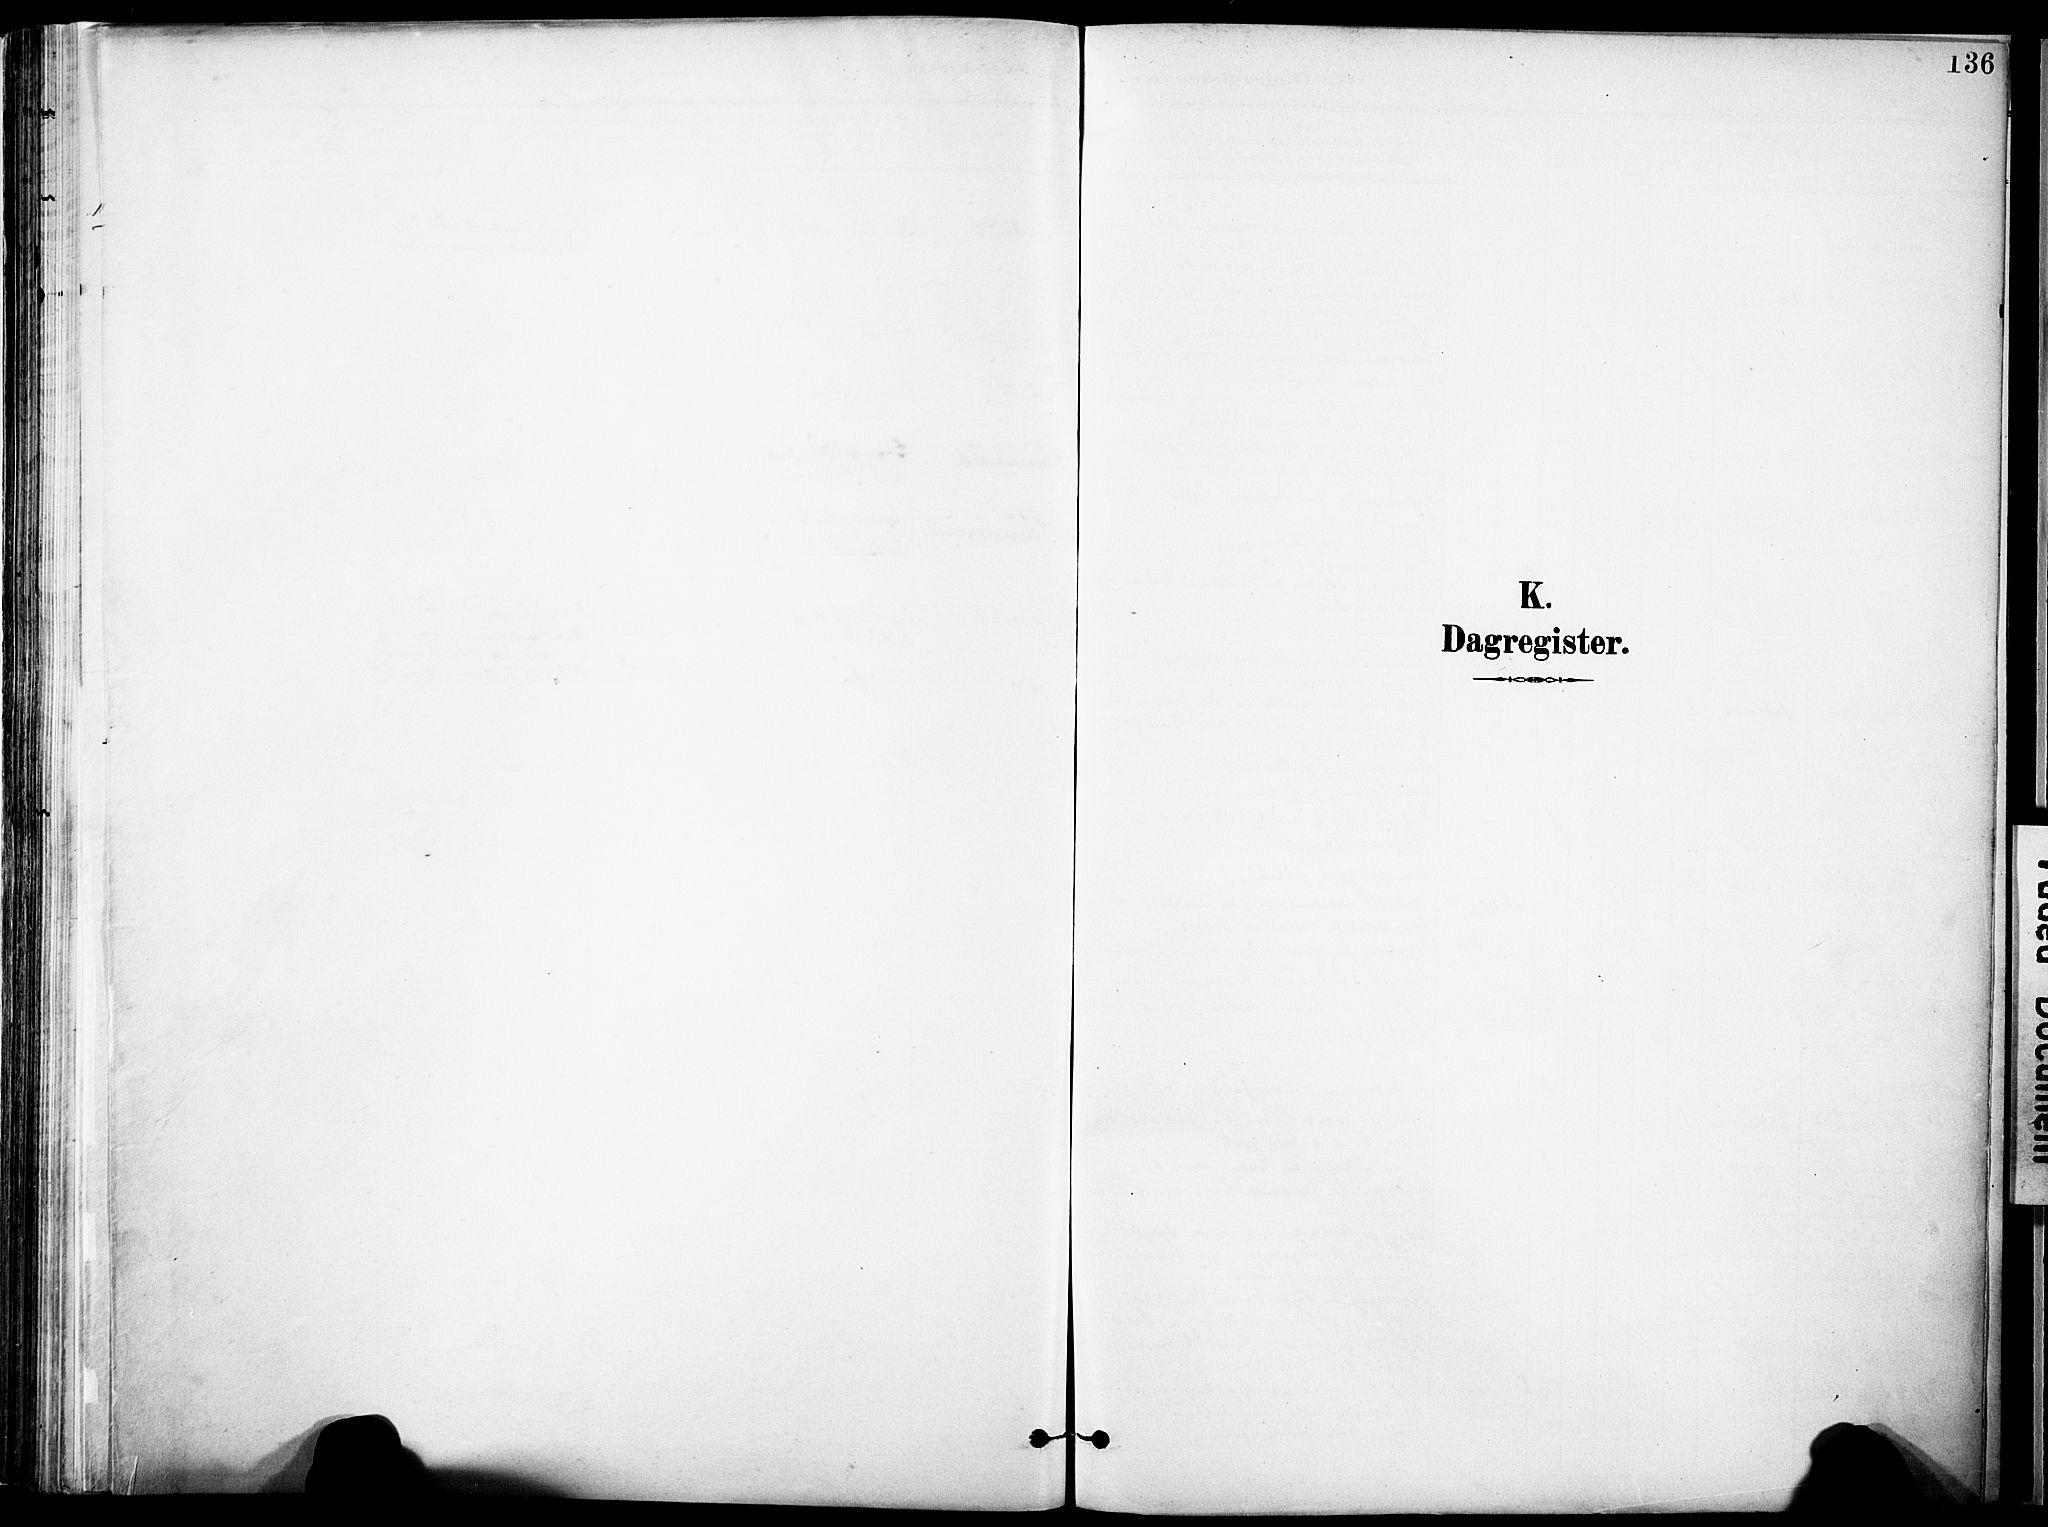 SAH, Nordre Land prestekontor, Ministerialbok nr. 6, 1897-1914, s. 136